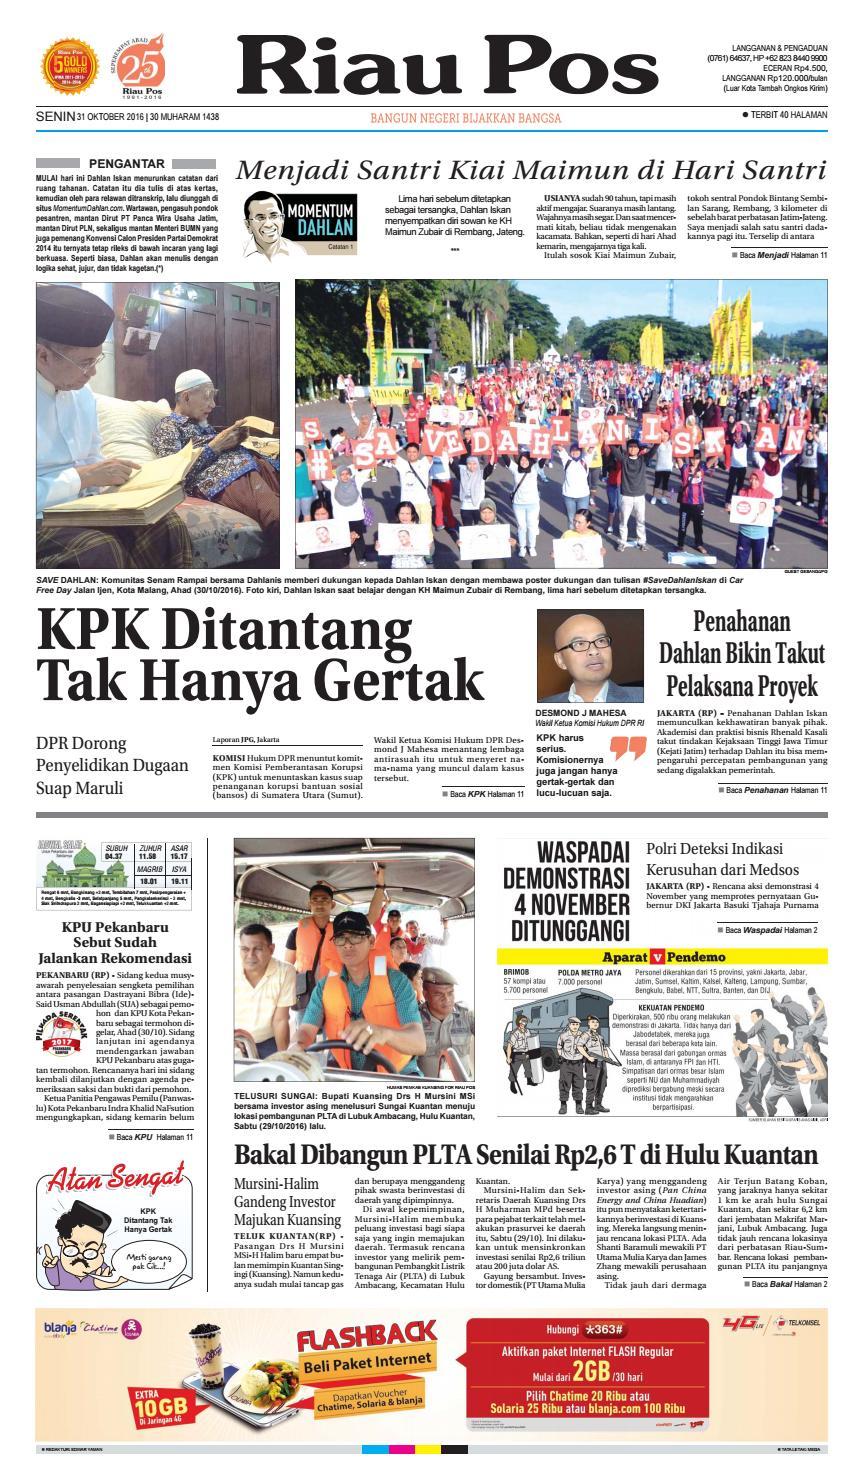 2016 10 31 By Riau Pos Issuu Produk Ukm Bumn Tenun Pagatan Kemeja Pria Biru Kapal